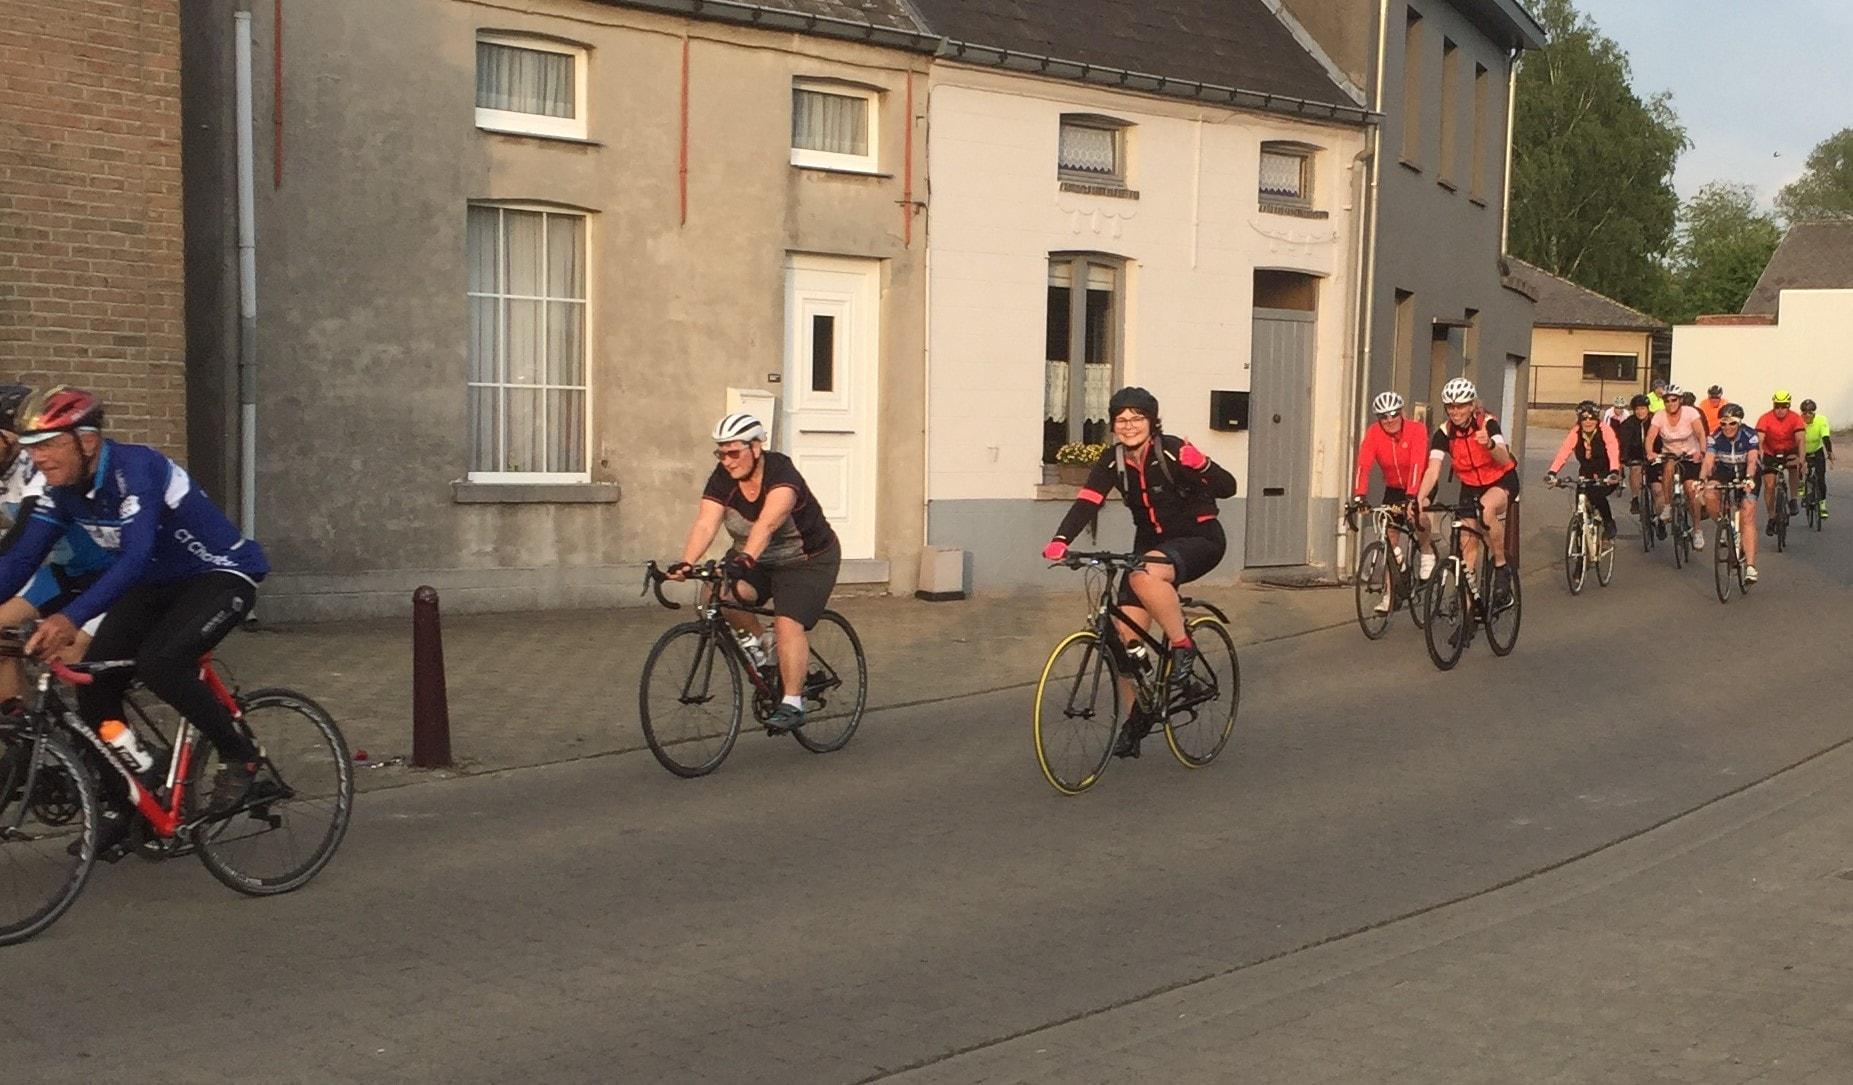 ritje start to cycle - eindpunt in zicht - 3